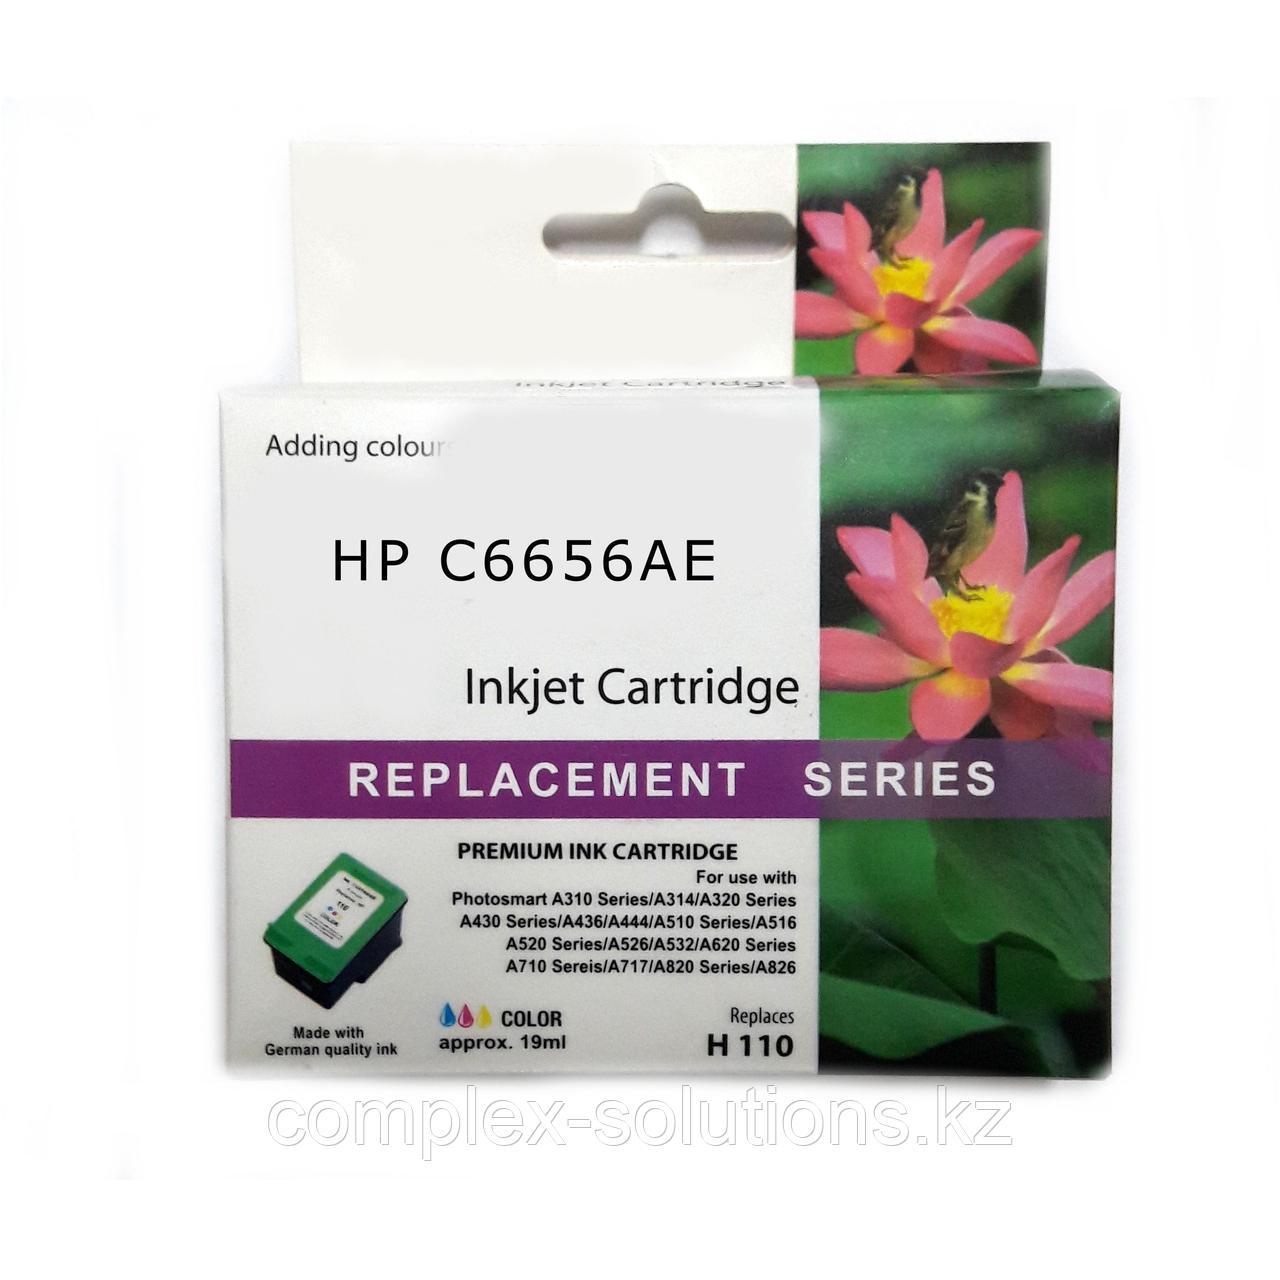 Картридж HP C6656AE Black,№56 JET TEK | [качественный дубликат]